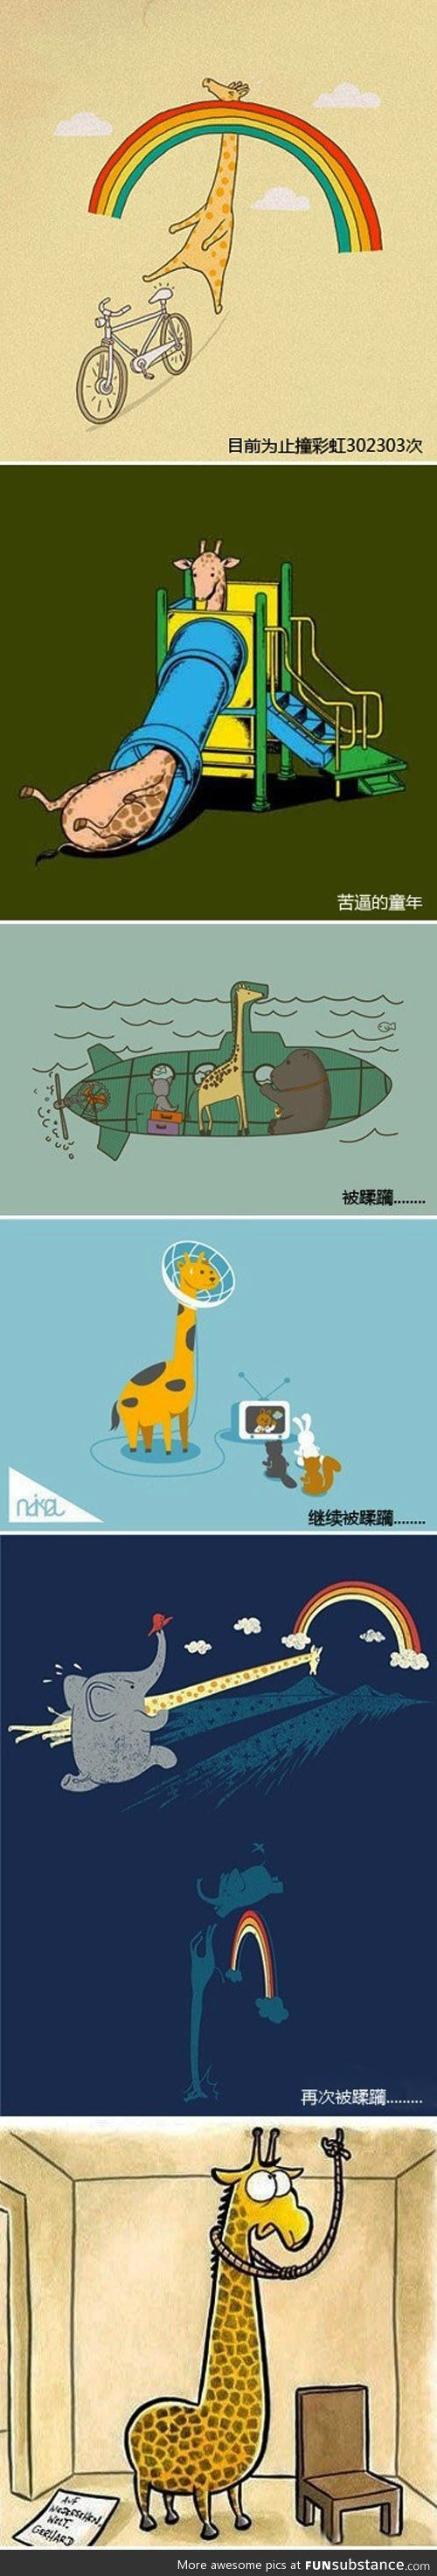 Poor Giraffe